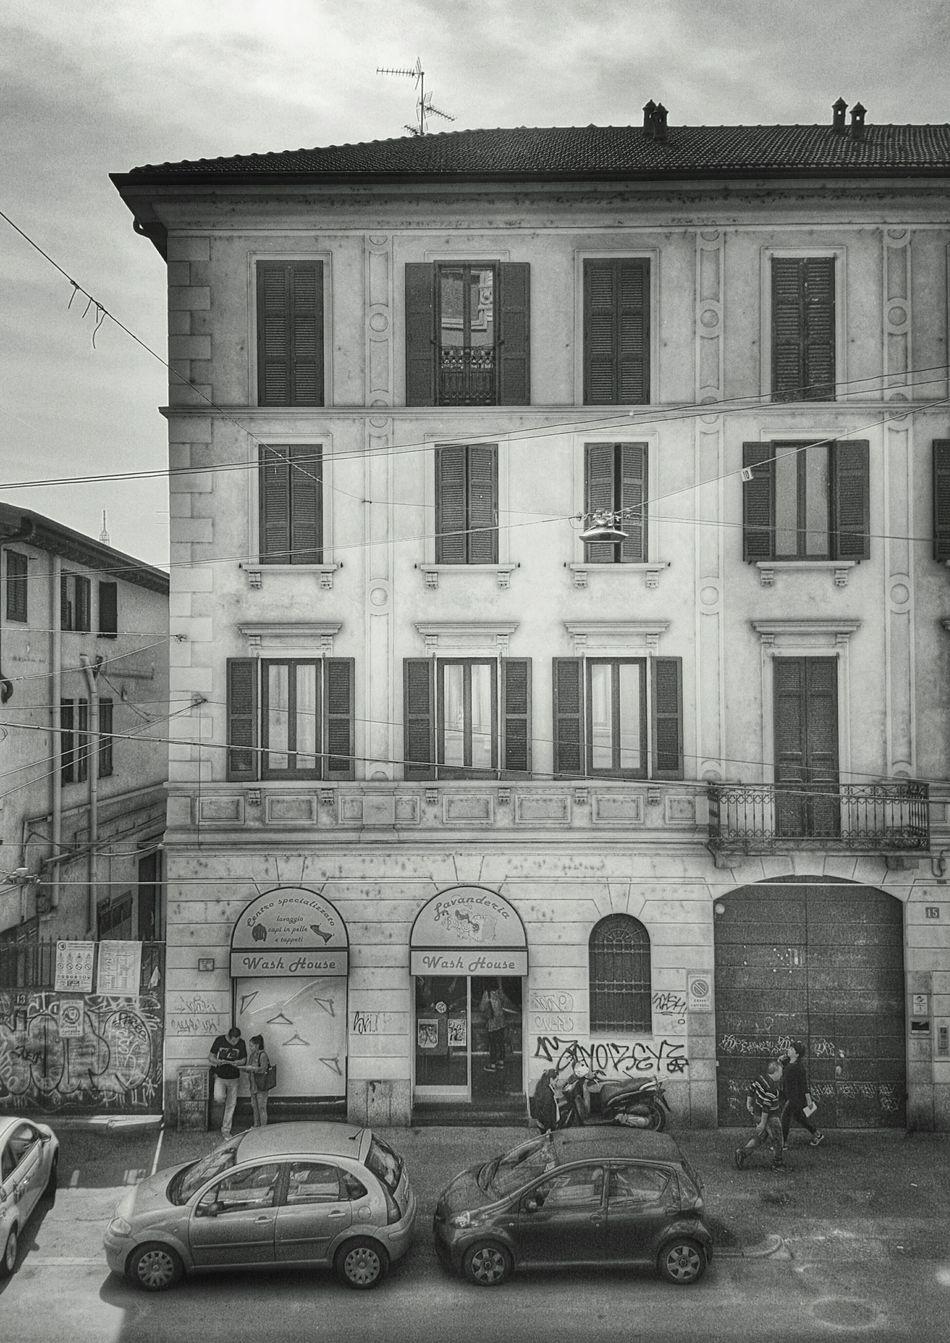 Architecture EyeEm Gallery Urban B&W Urban Geometry EyeEm Italy Milan EyeEm Best Shots Taking Photos Black & White Expo2015